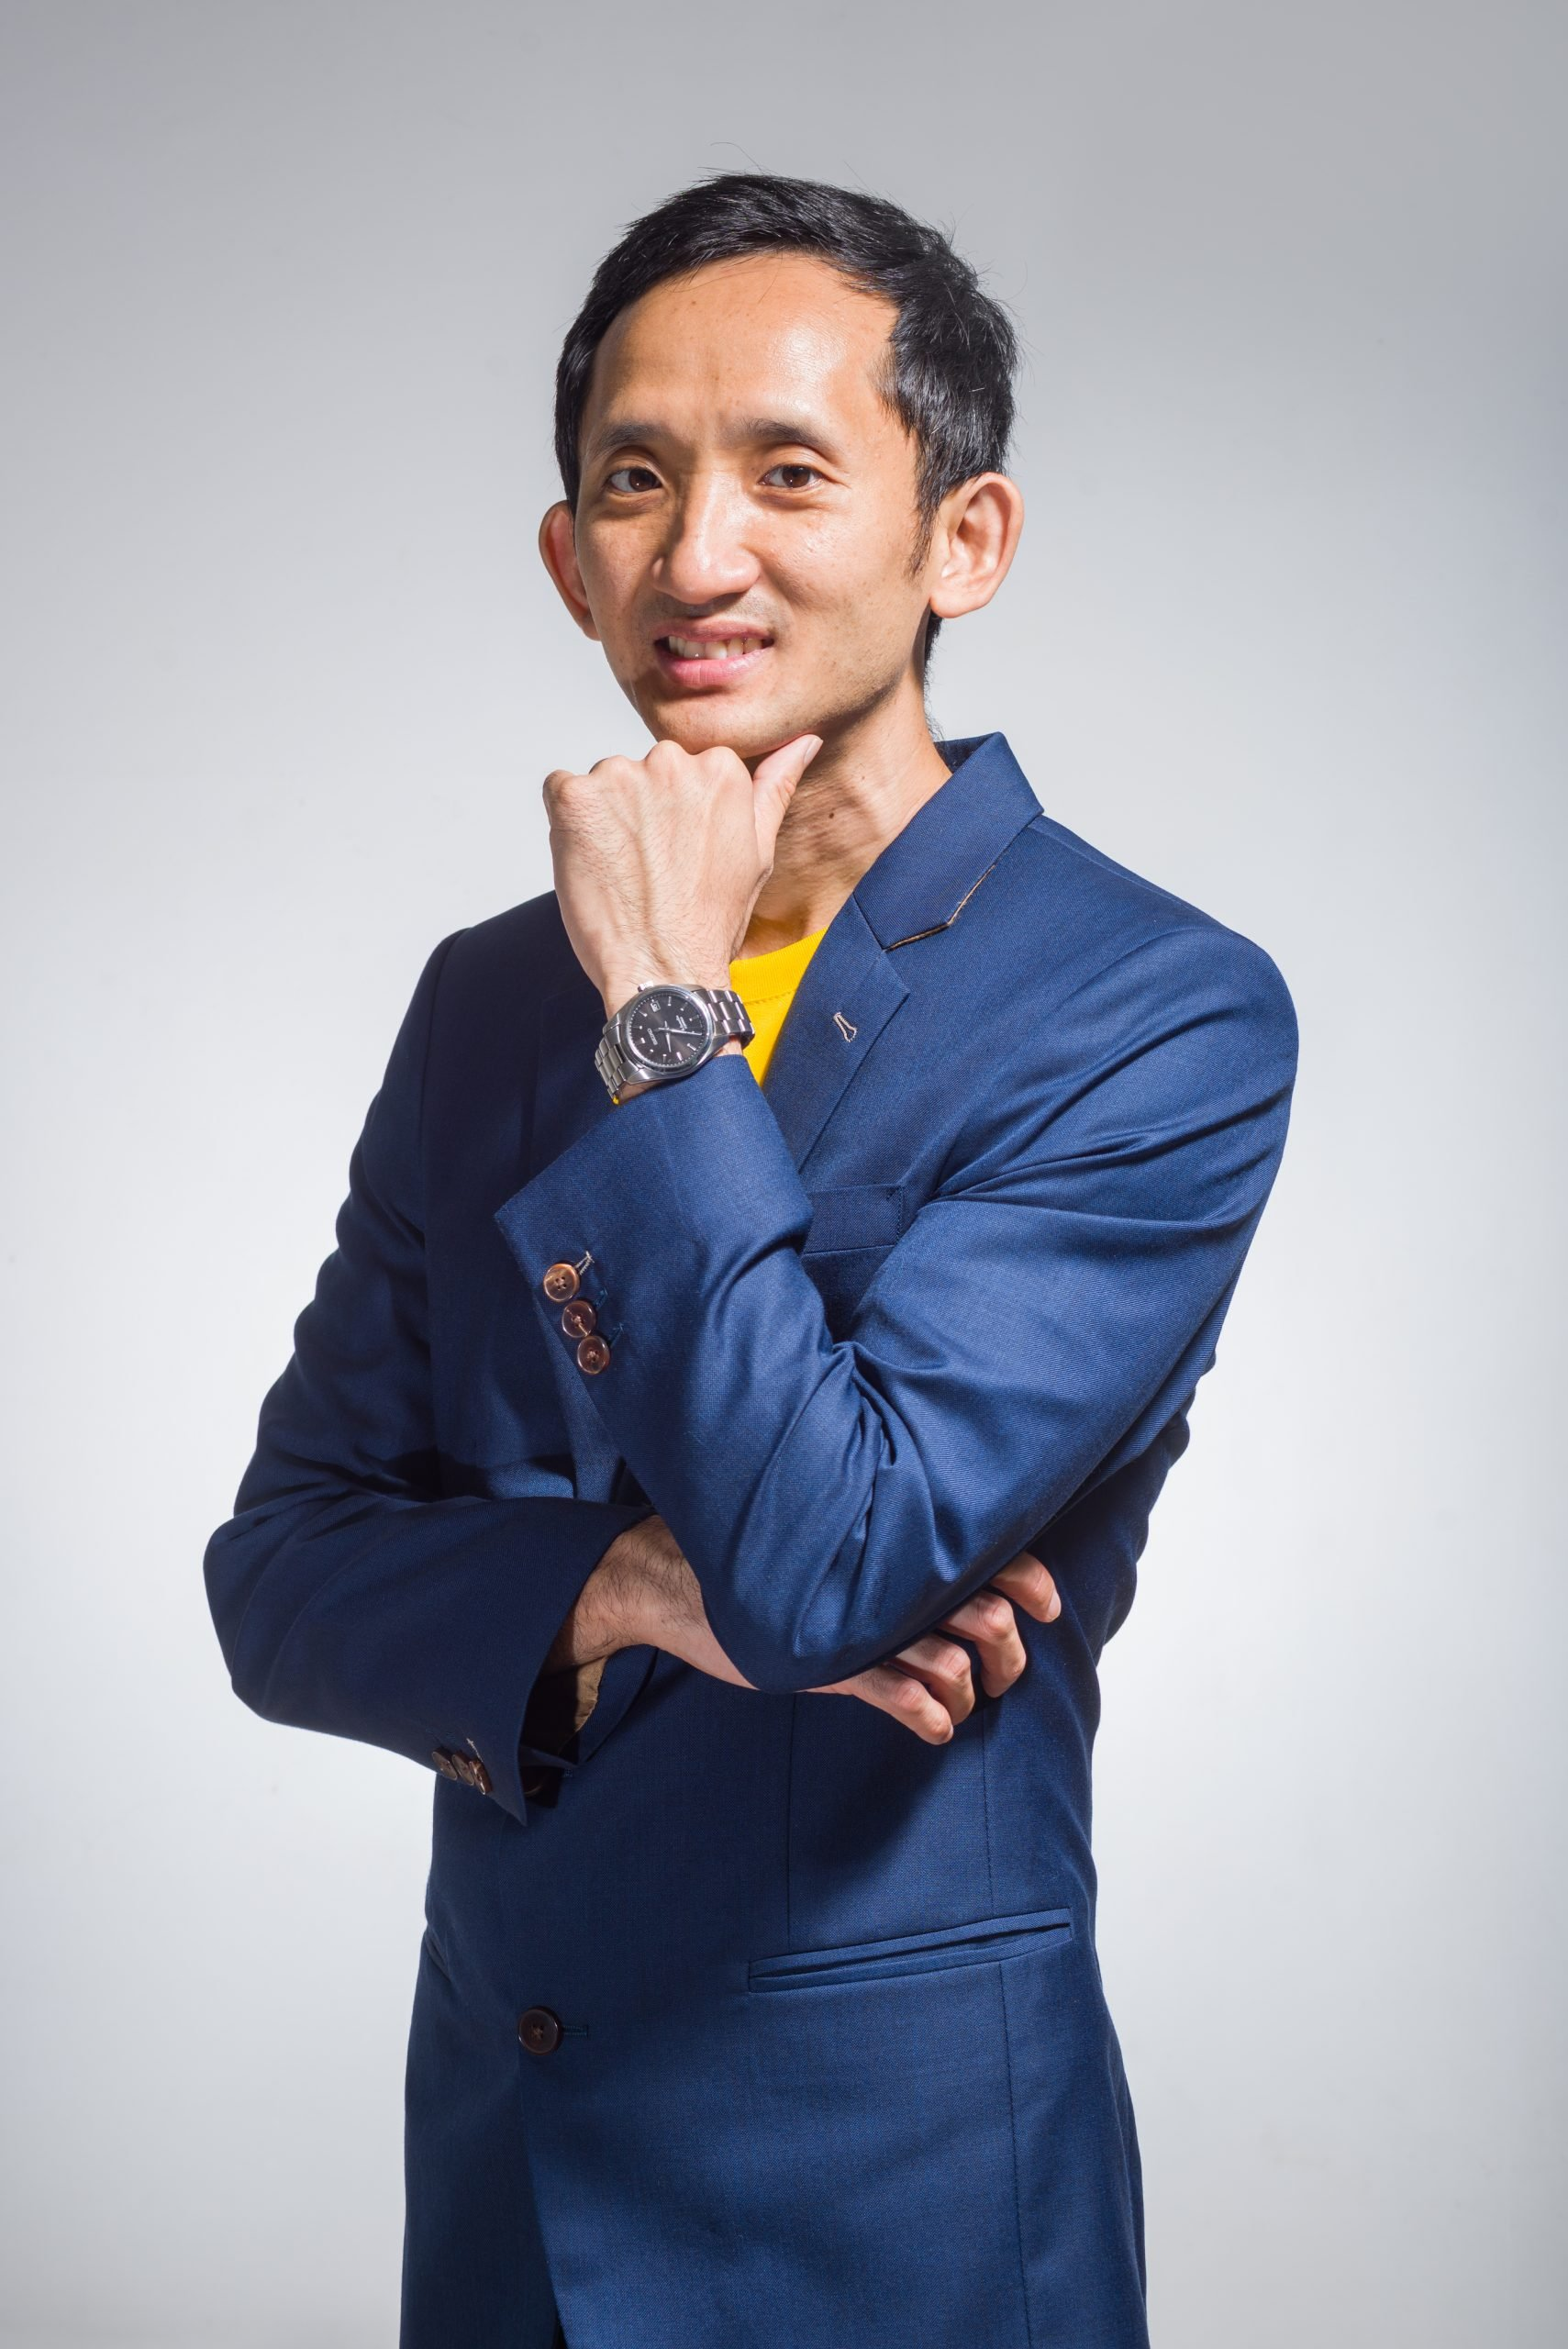 yuan Tai, Corporate Trainer Singapore